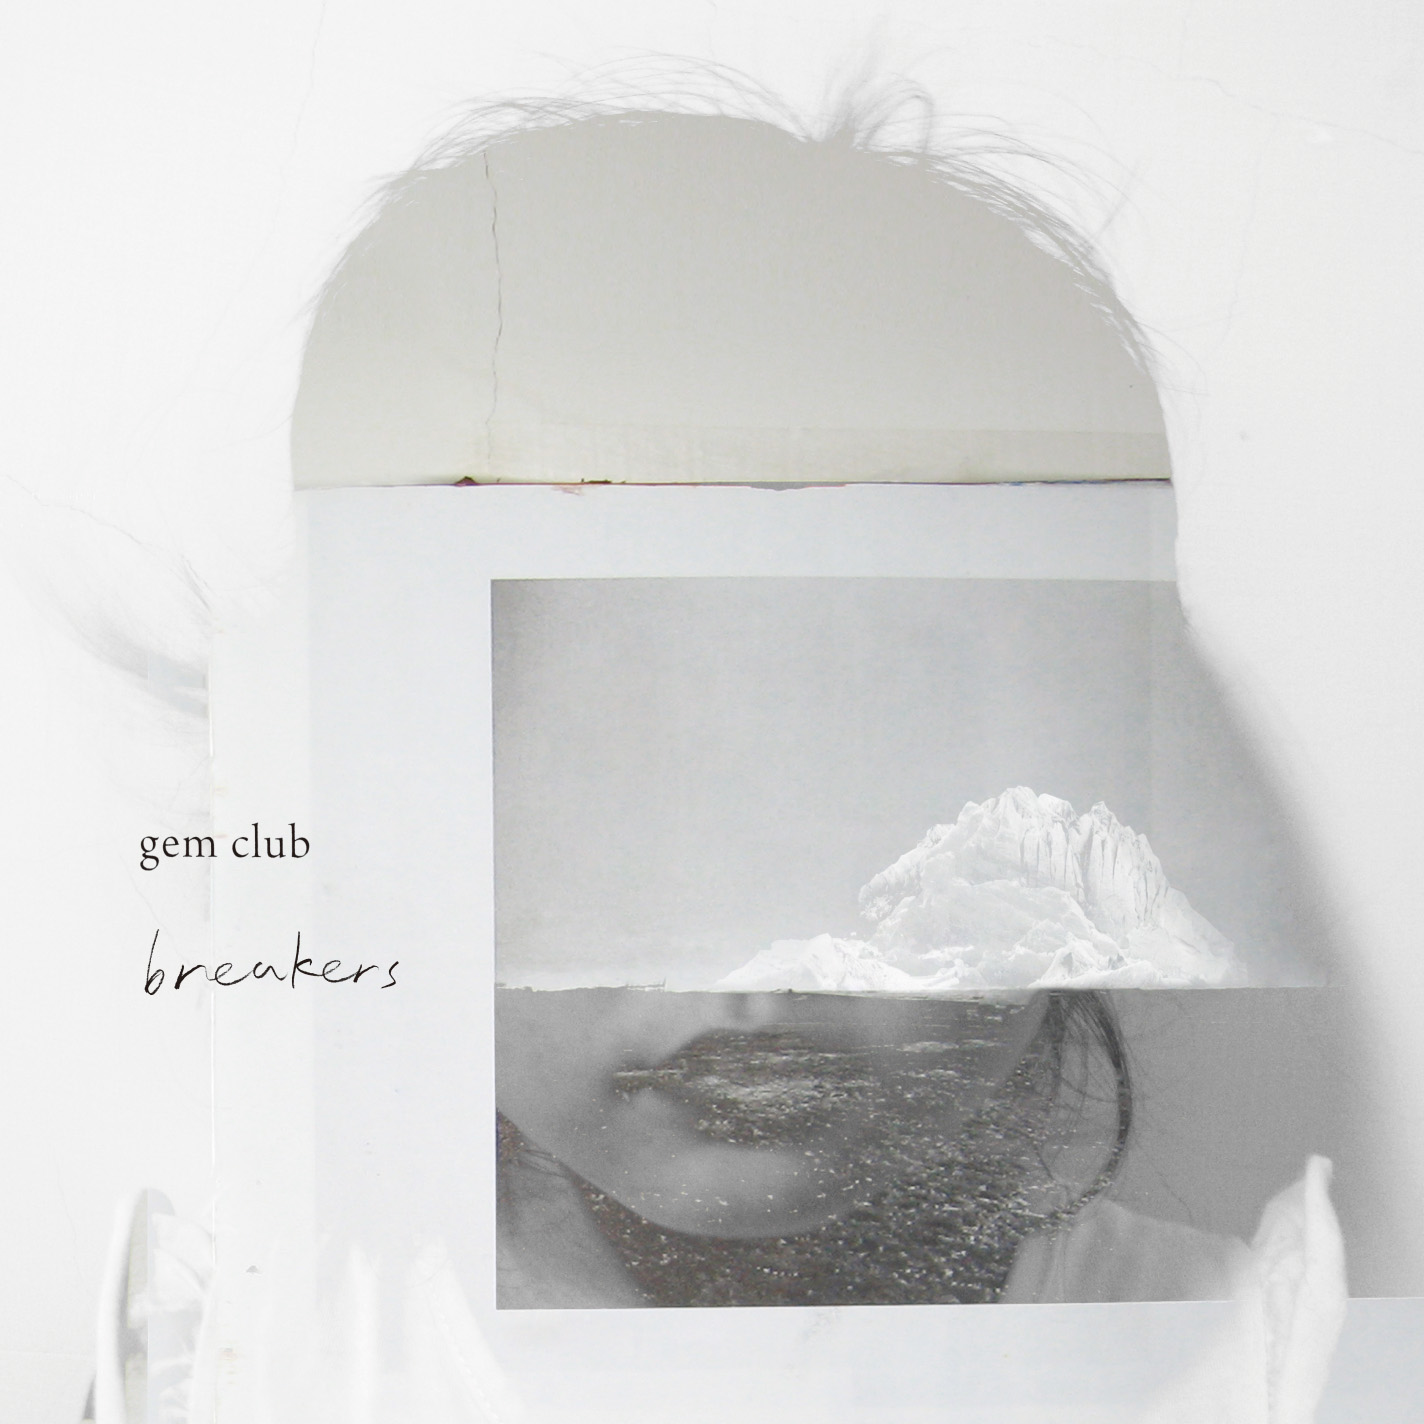 Gem Club - Breakers